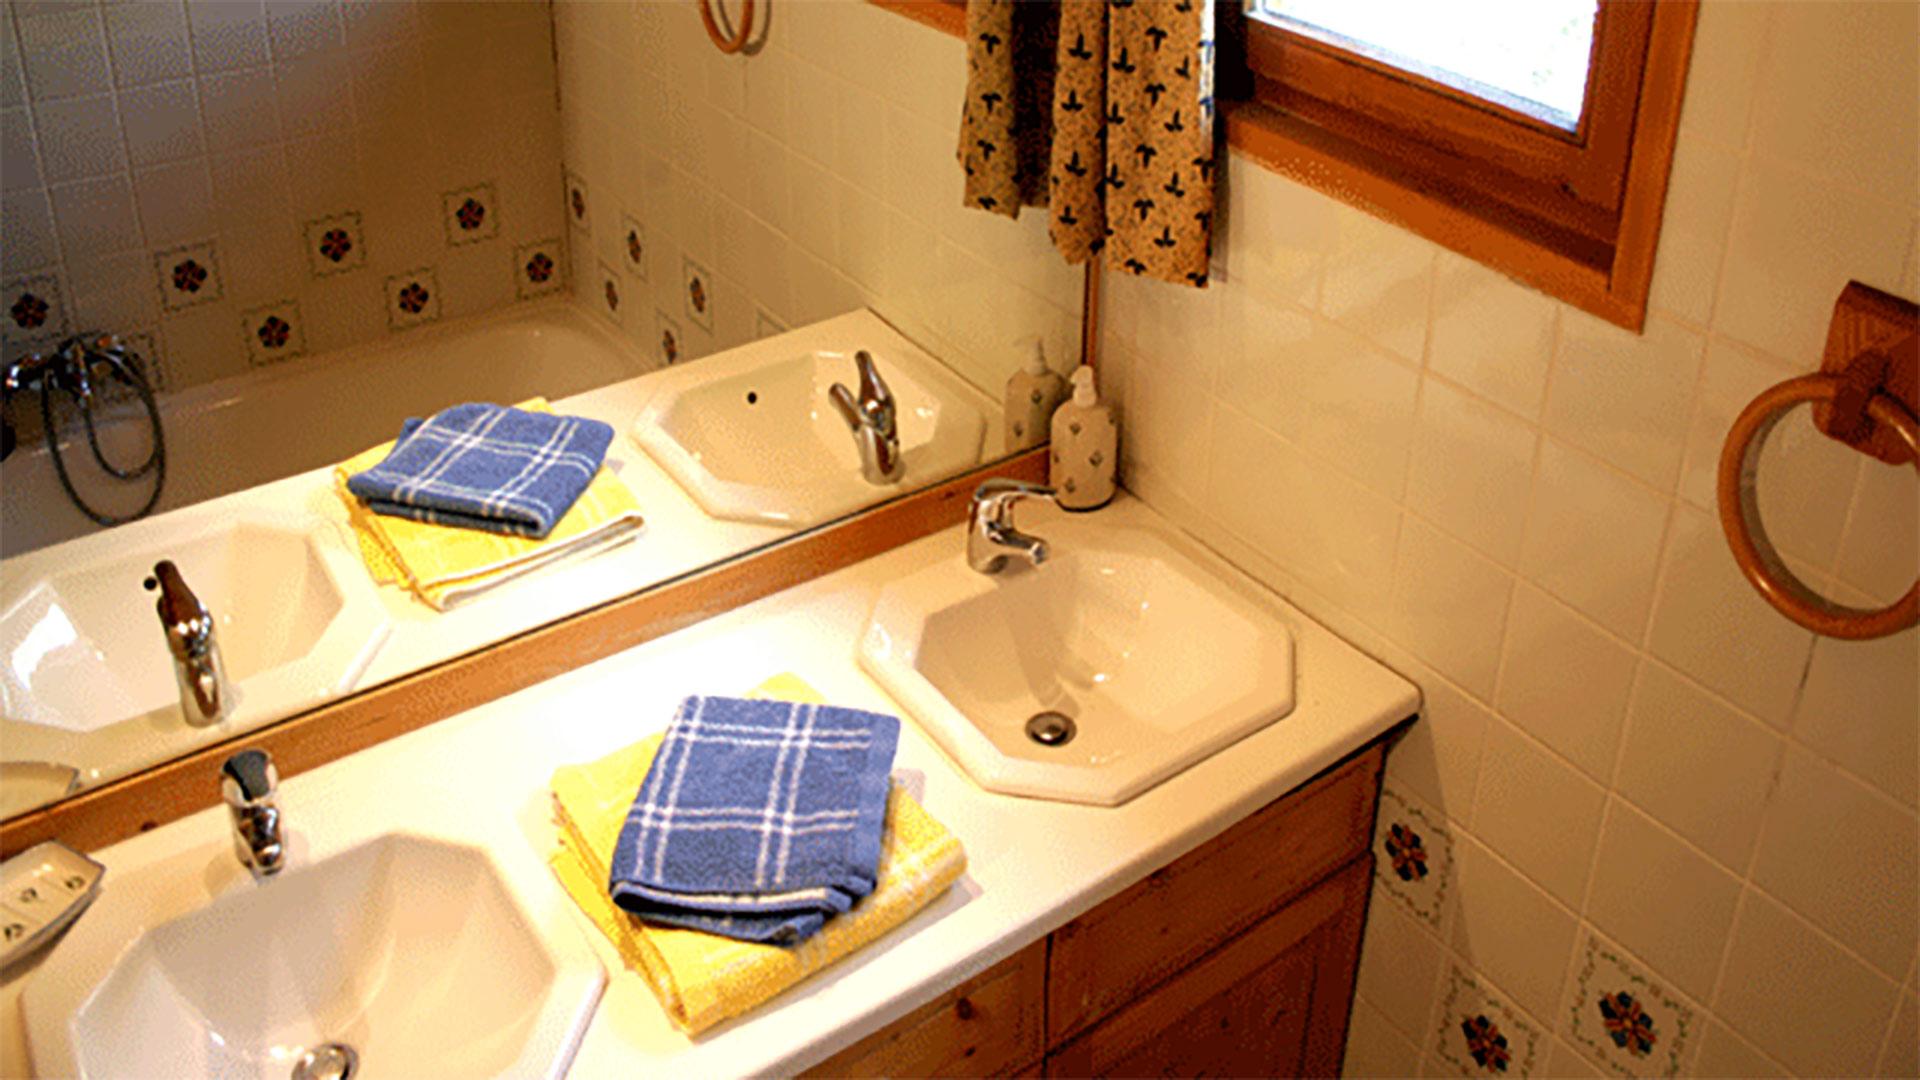 St-Charles-salle-de-bains